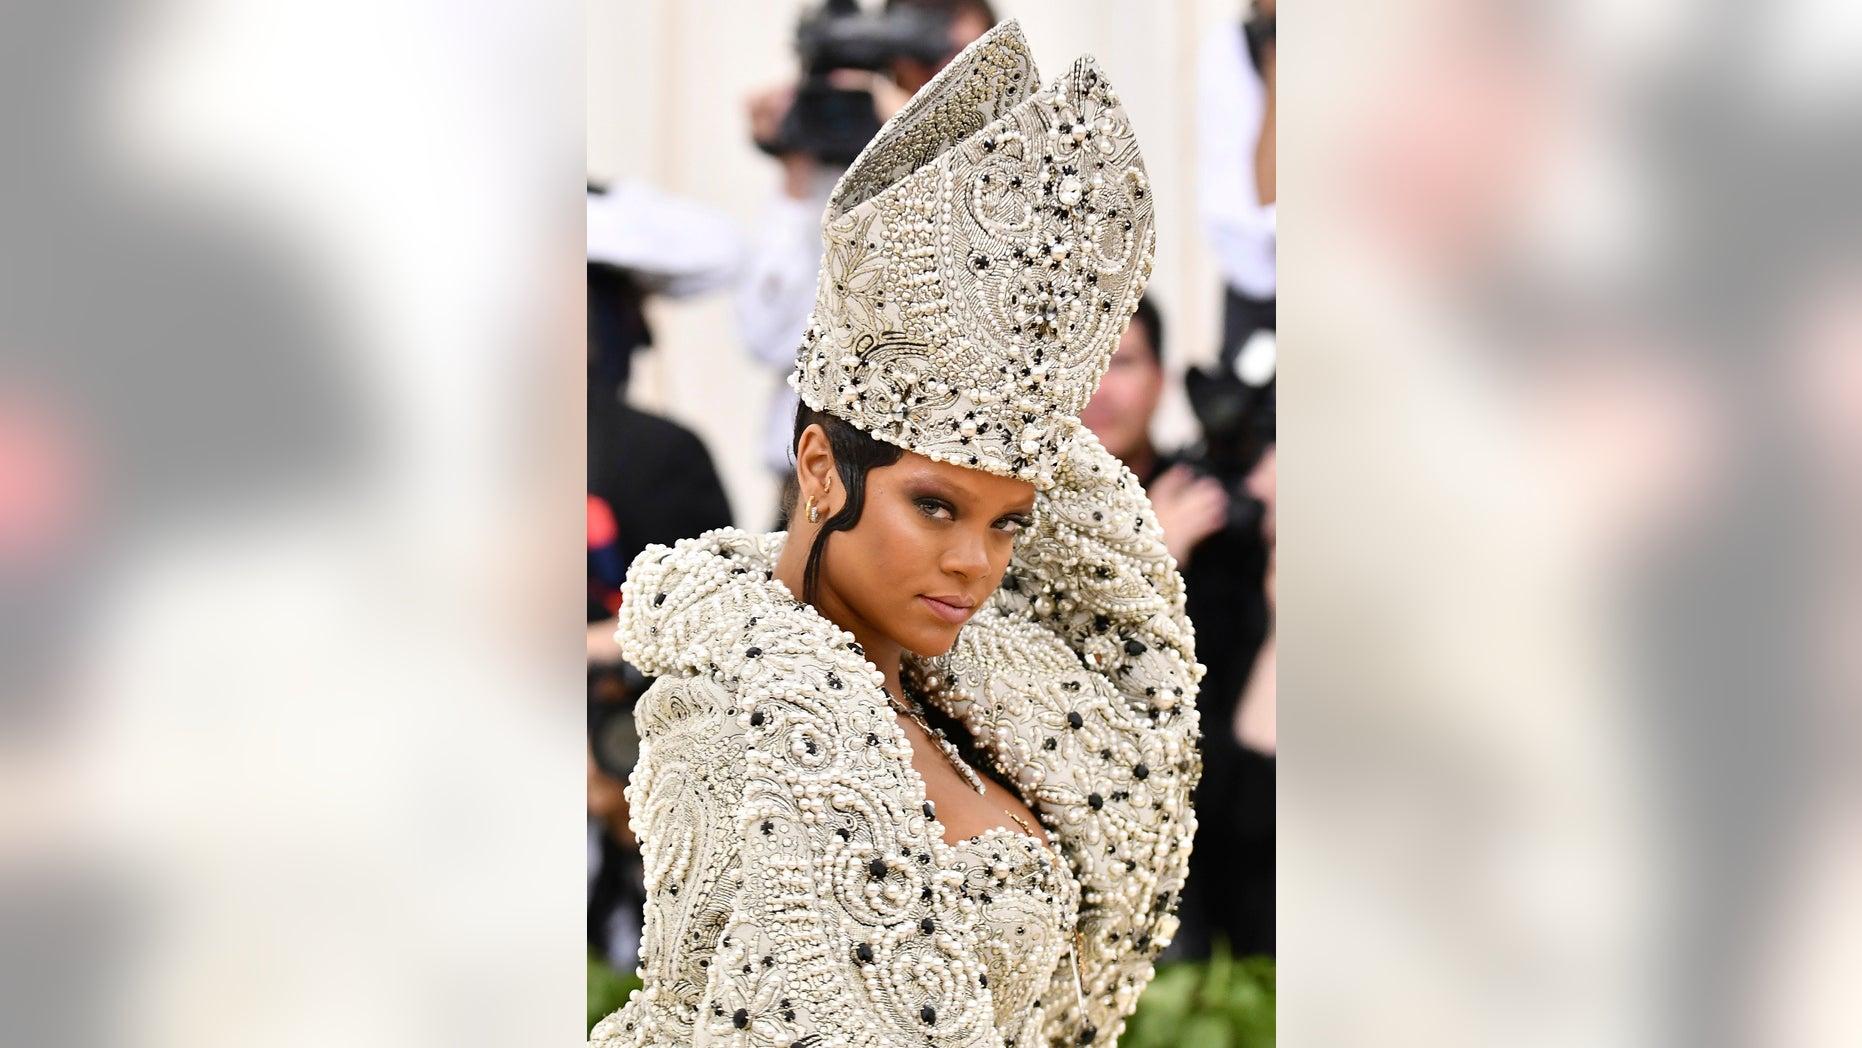 Rihanna at the 2018 Met Gala in New York City.